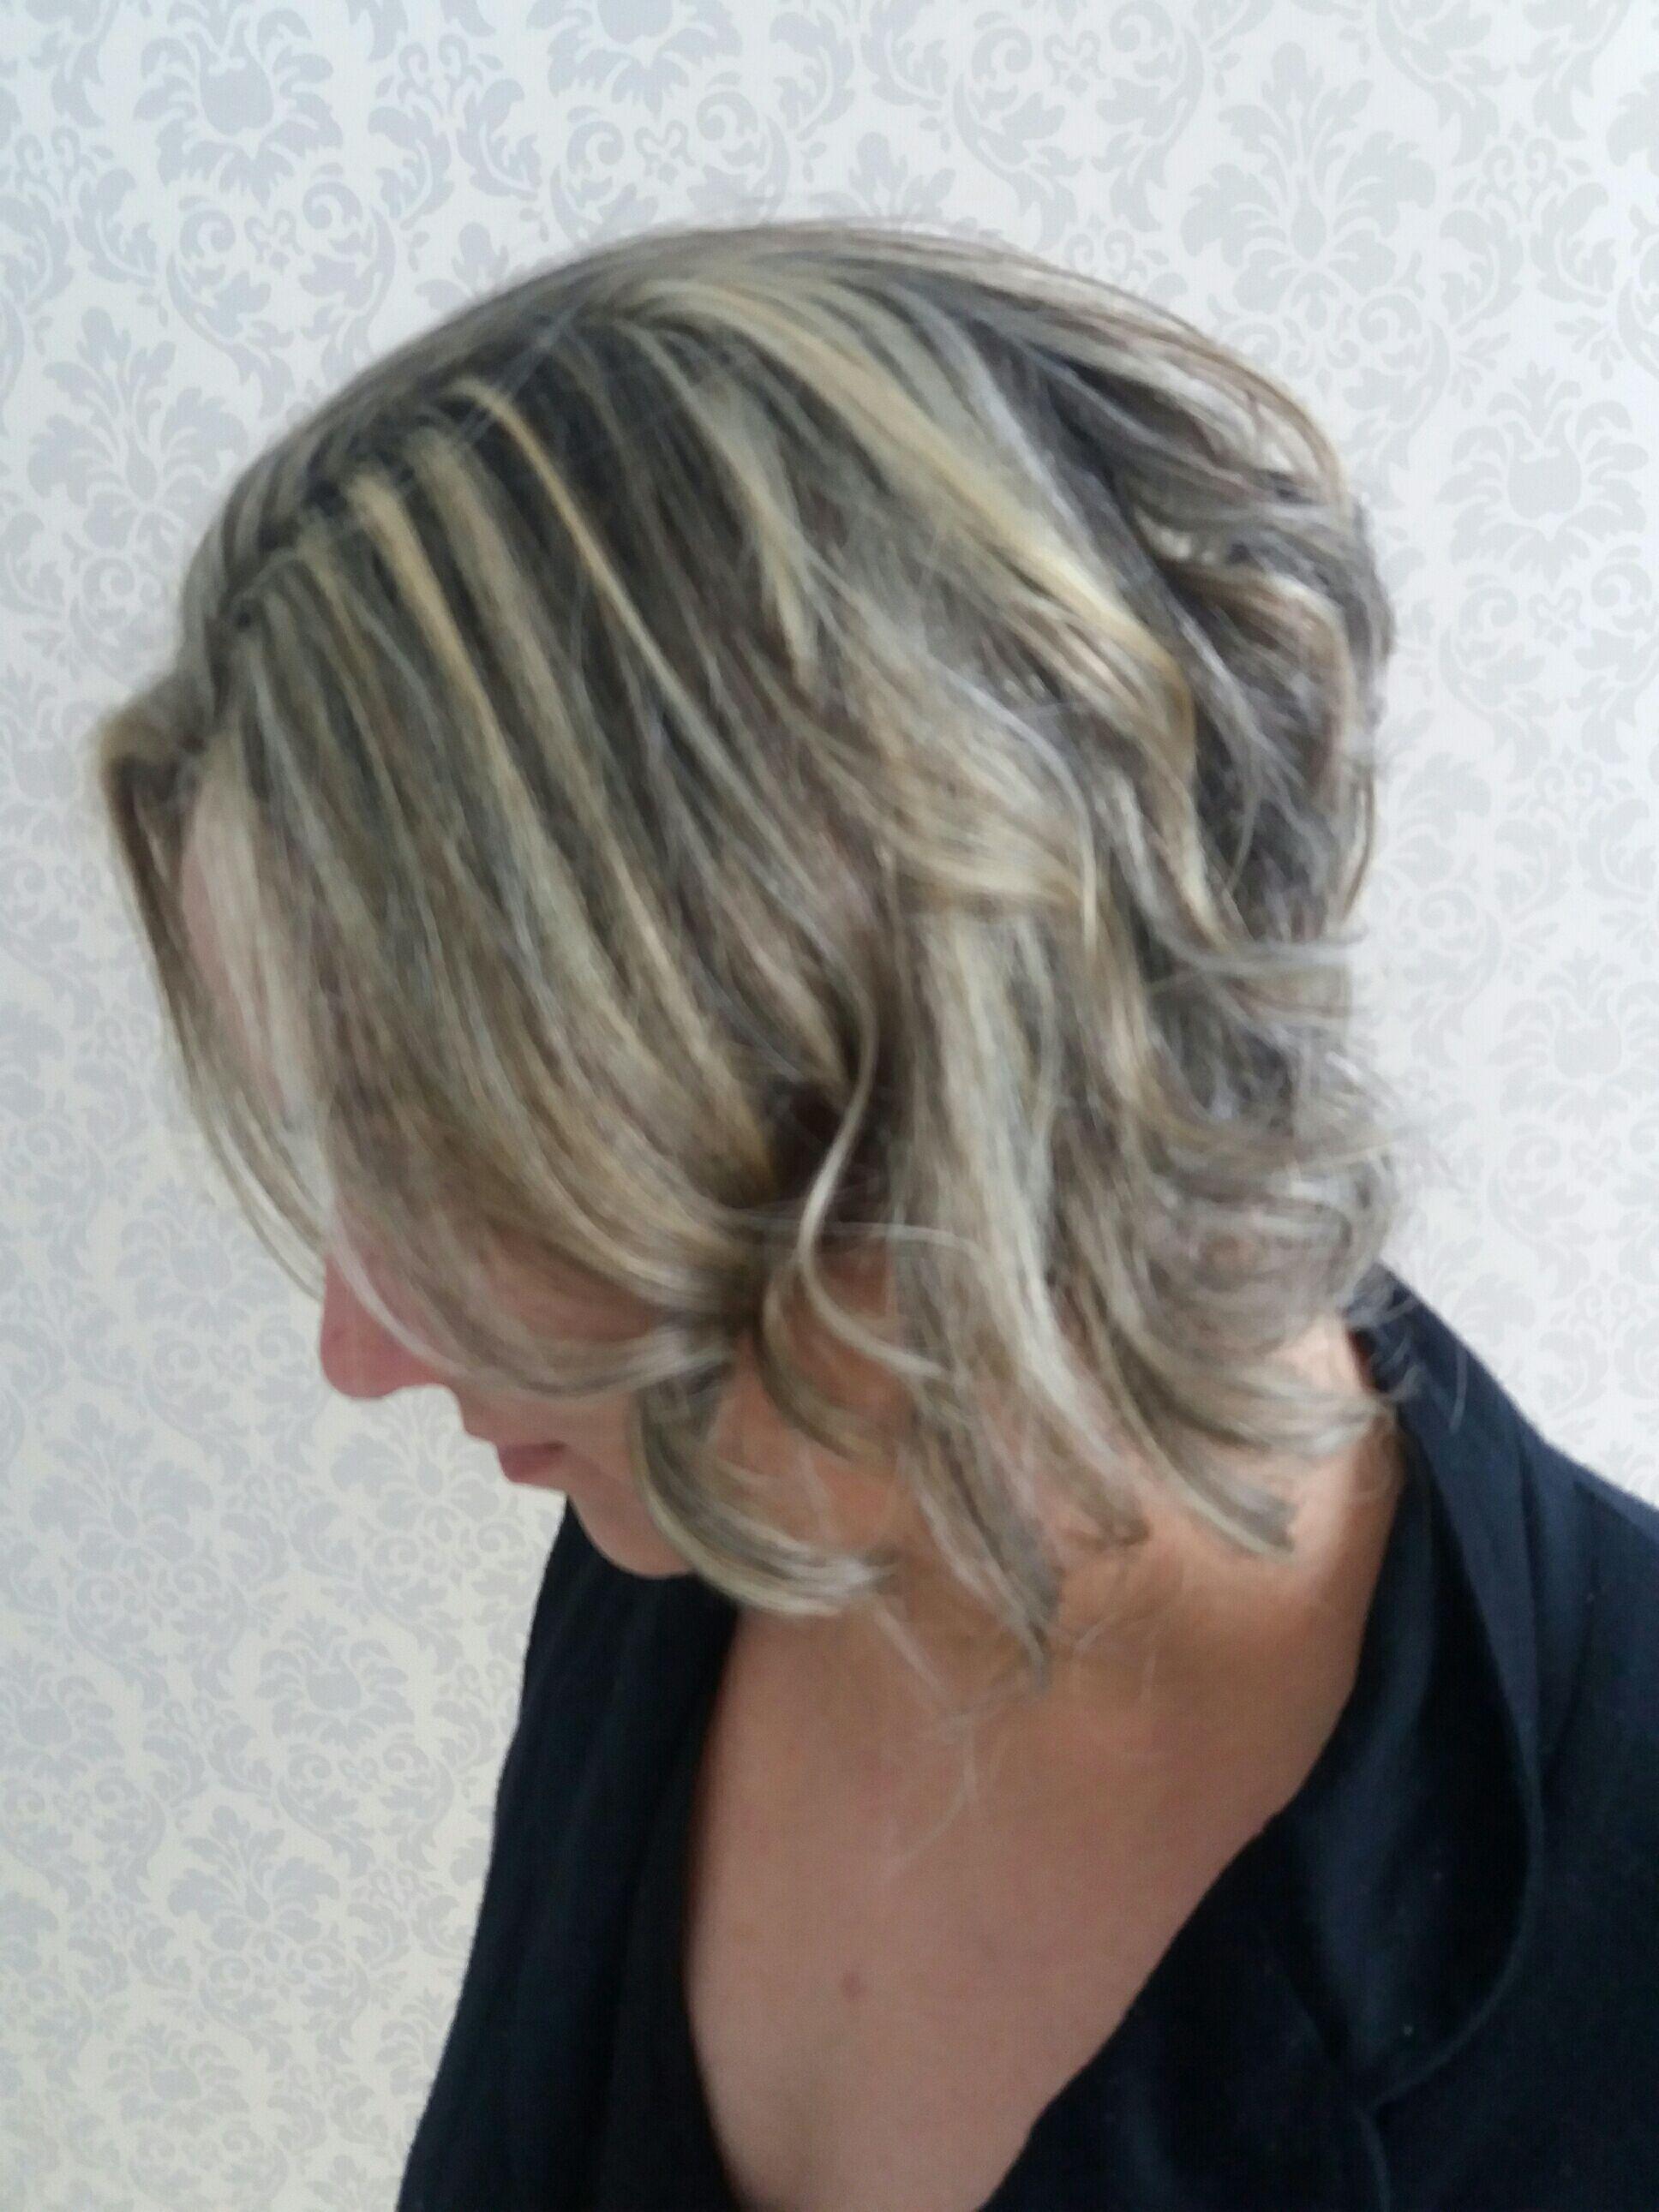 cabelo cabeleireiro(a) maquiador(a) cabeleireiro(a) cabeleireiro(a)